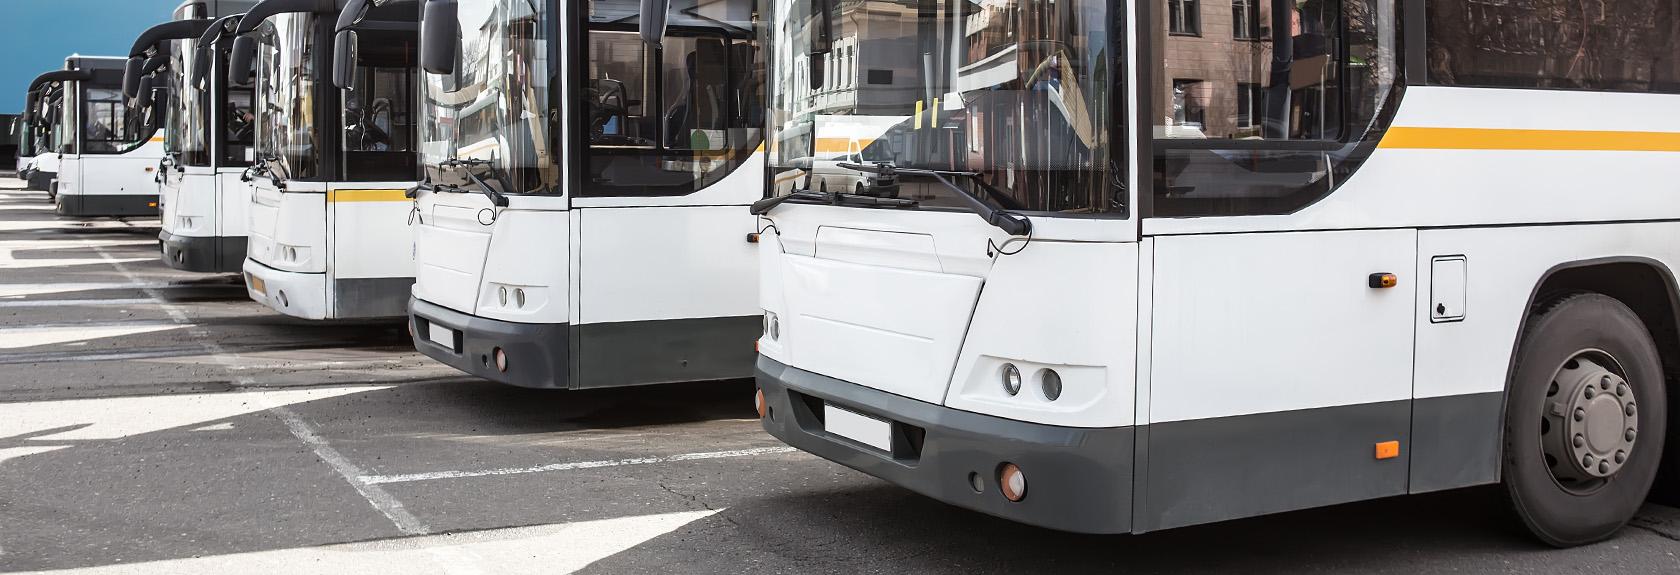 Bus transfer Luton Airport – Londen Centrum